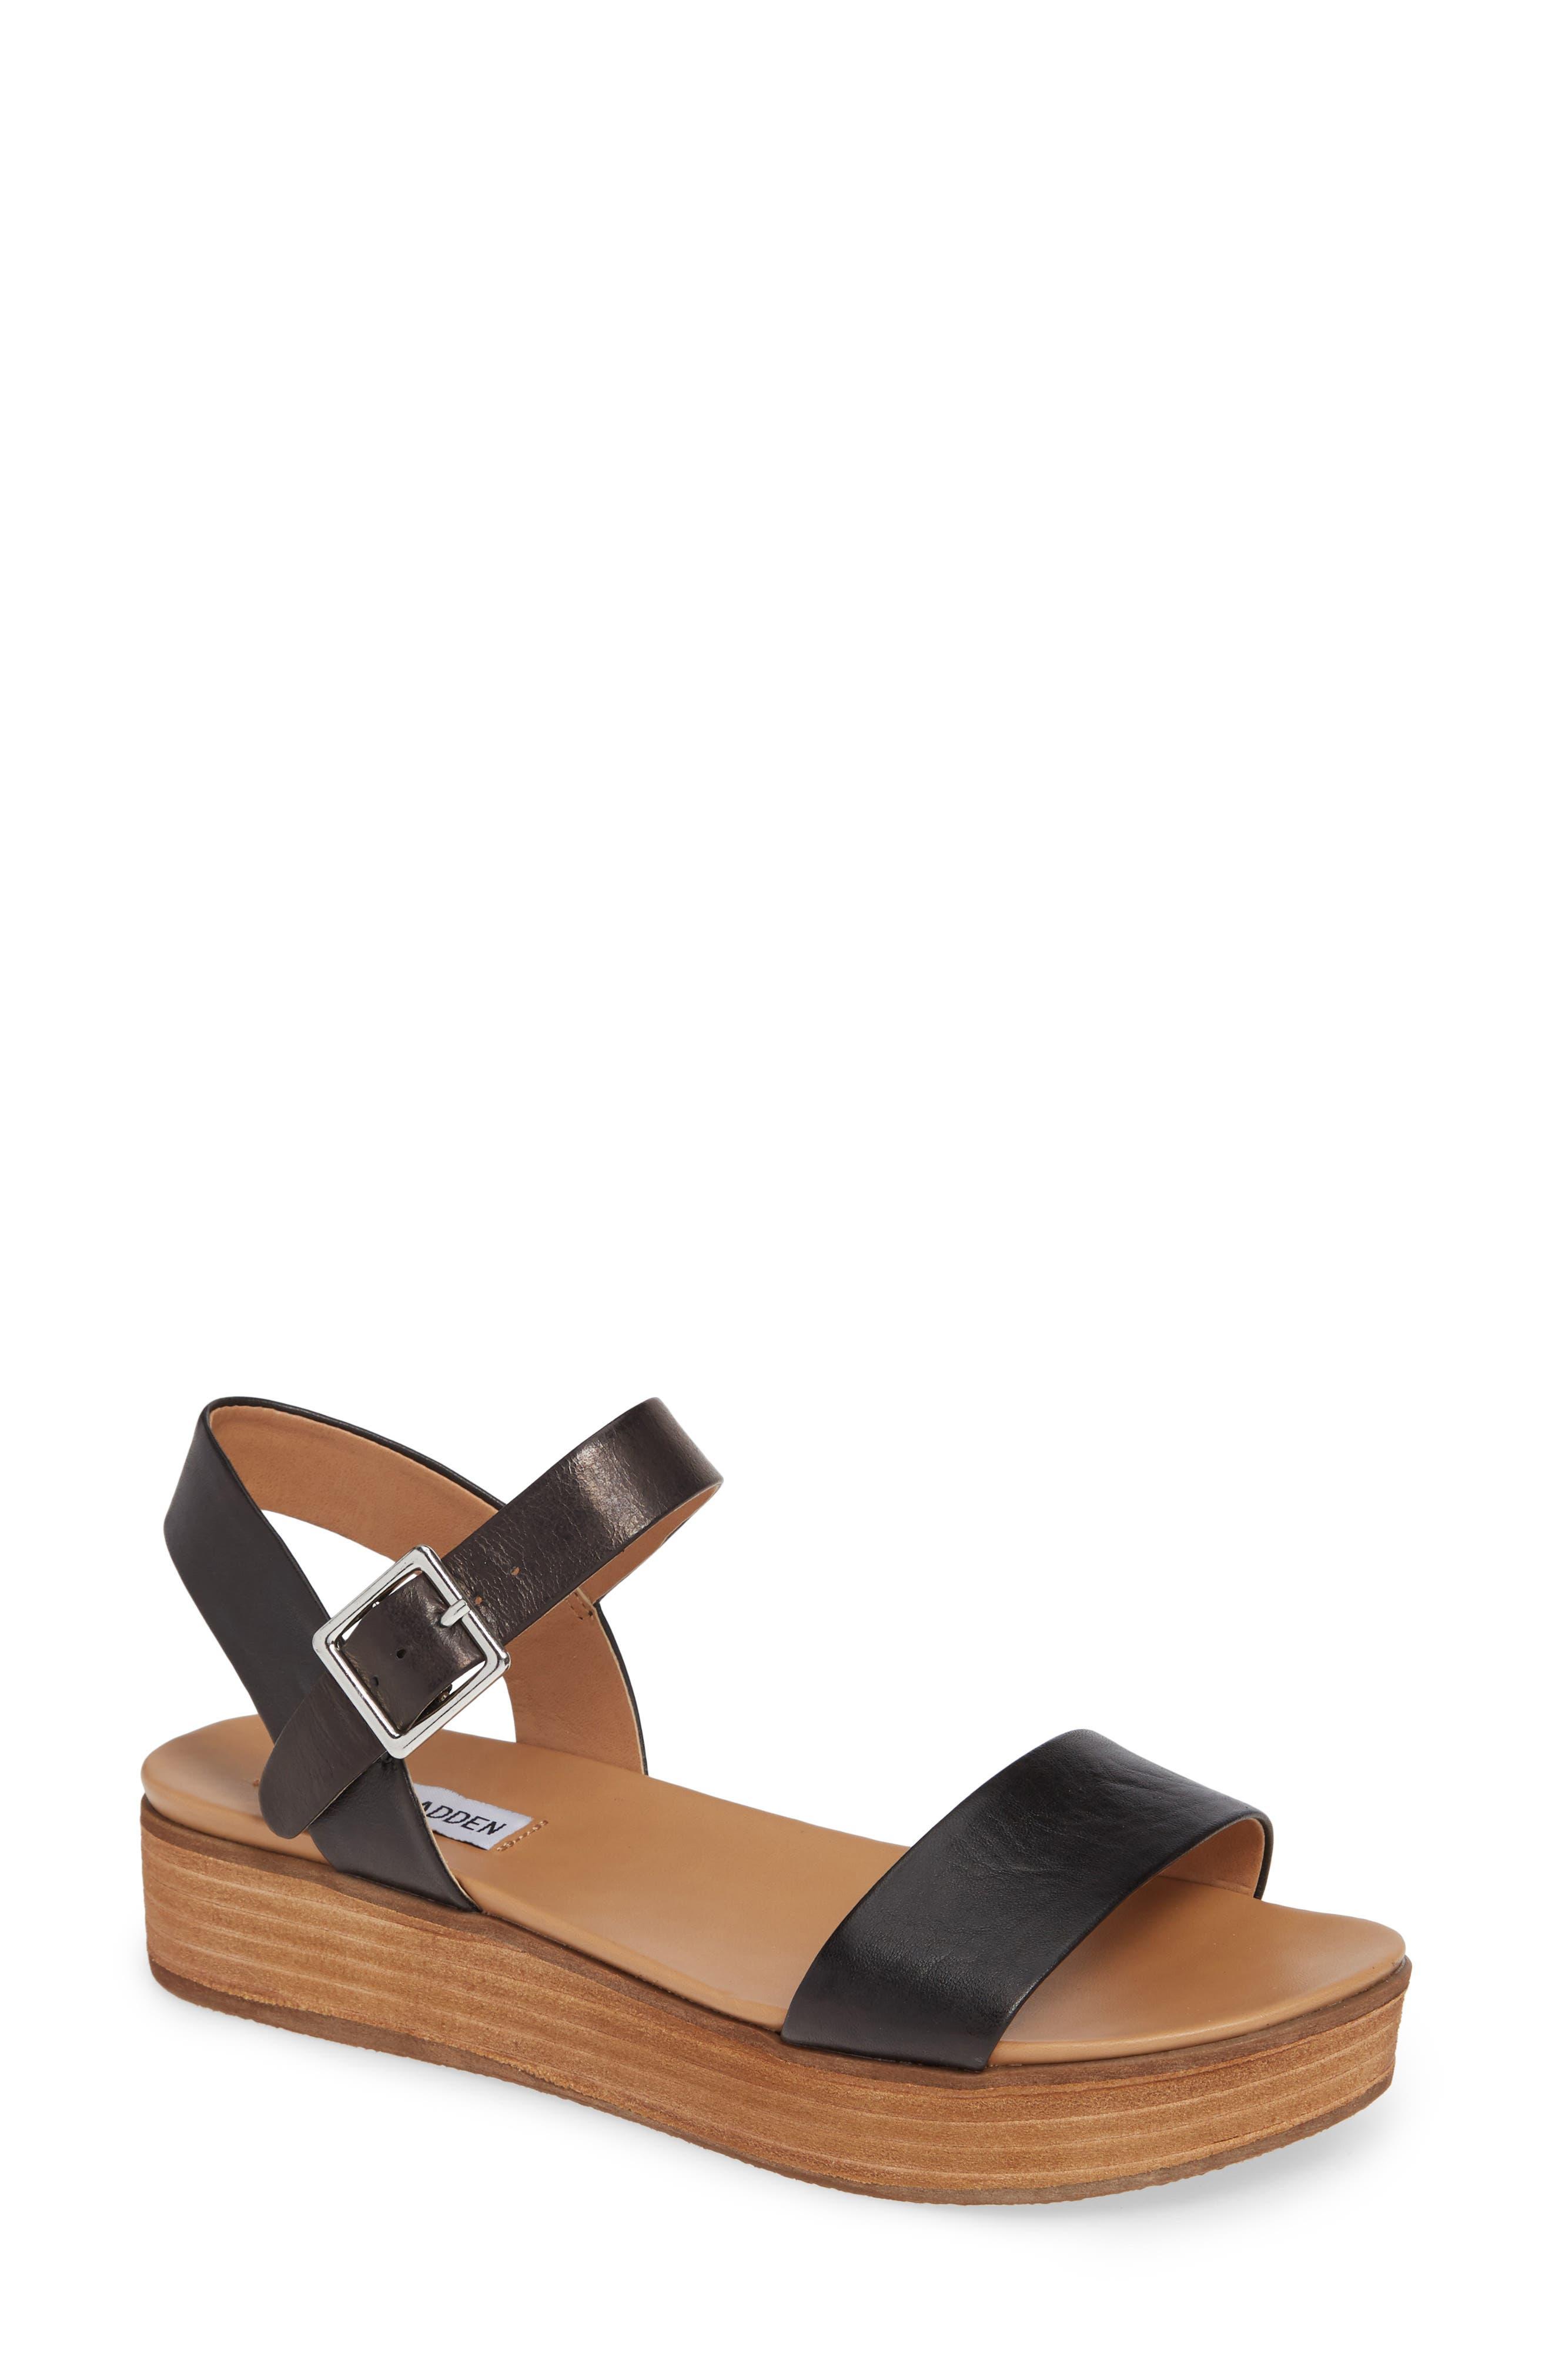 Aida Platform Sandal, Main, color, BLACK LEATHER